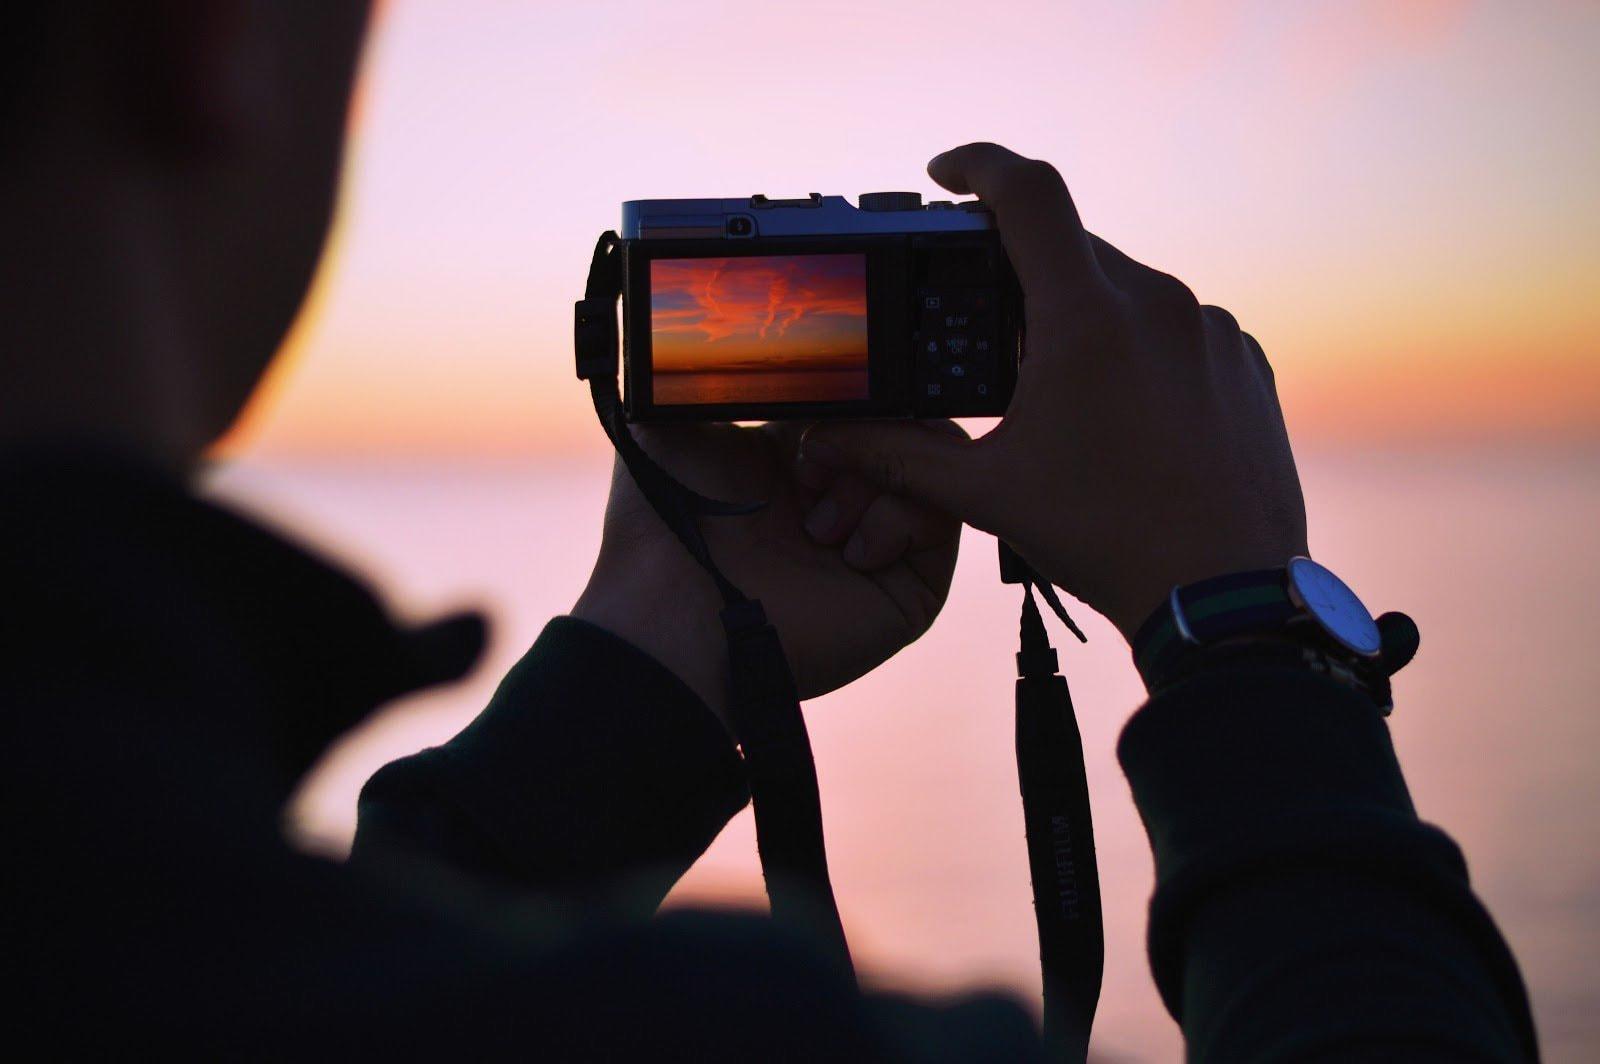 Sunset seen through a digital camera's display by Biel Morro